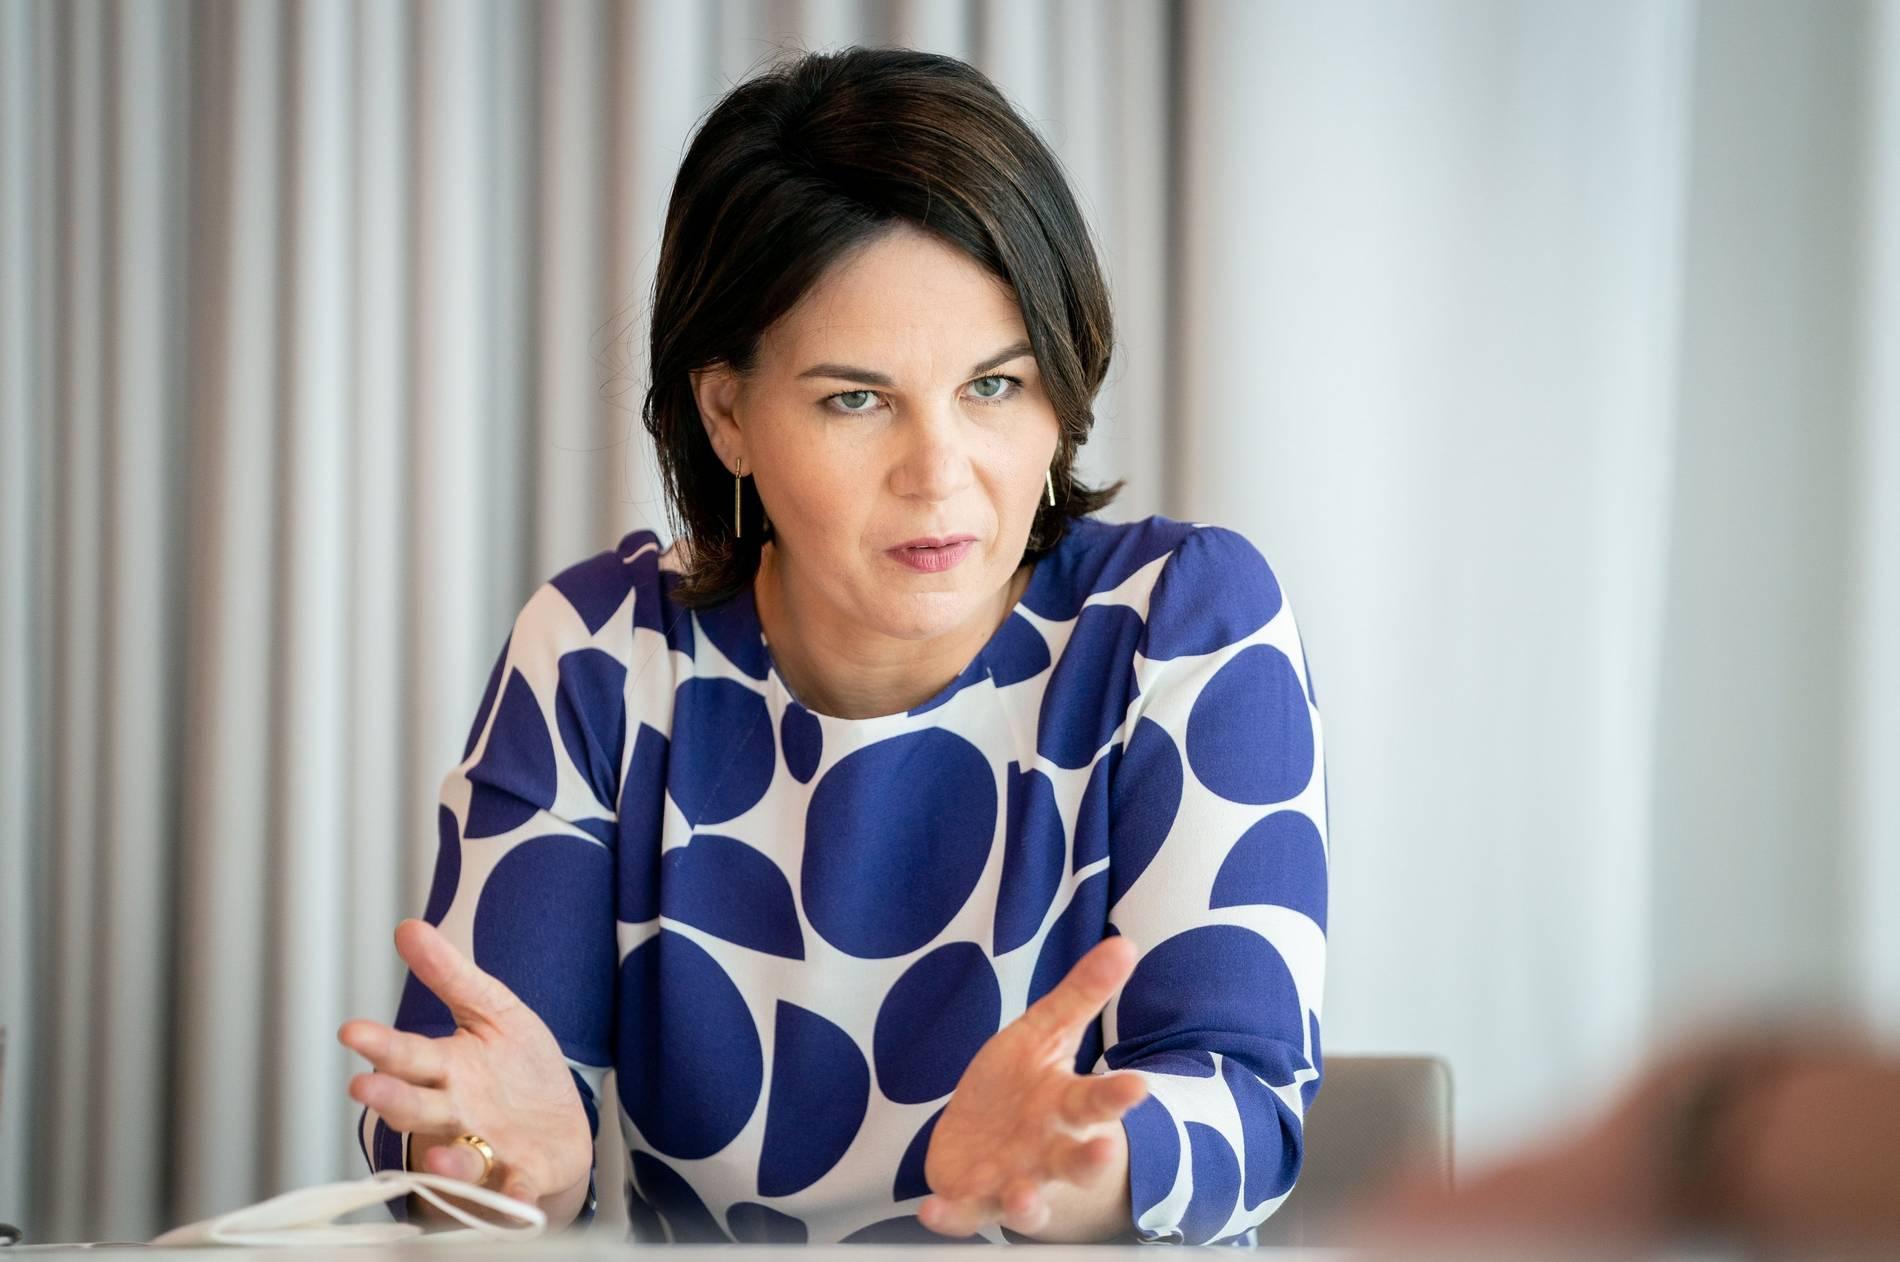 Korrigierte Details im Lebenslauf Grünen-Kanzlerkandidatin Annalena Baerbock